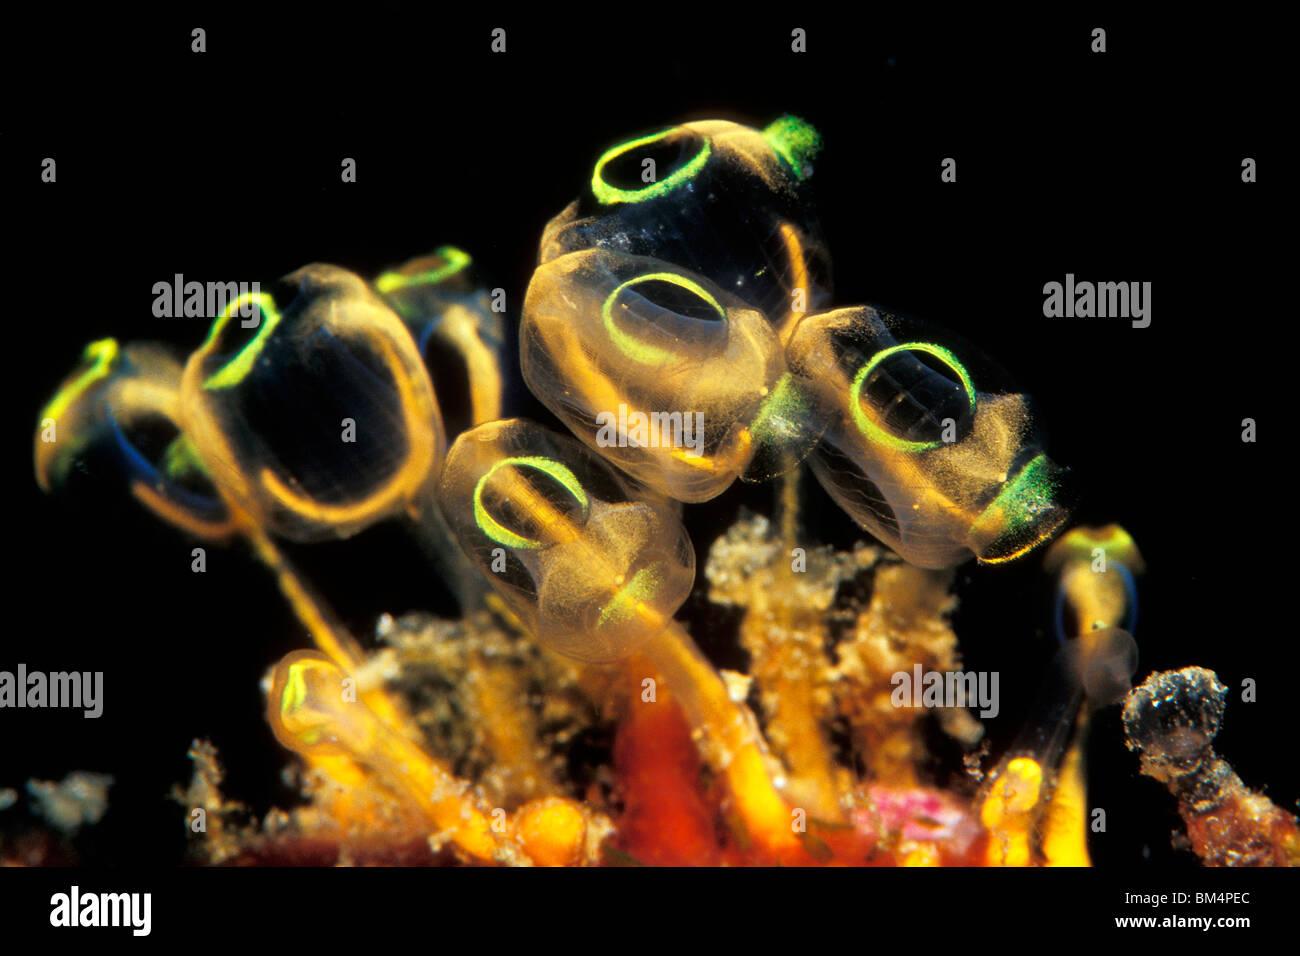 Kolonie von Manteltieren, Clavelina Robusta, South Pacific, Solomones Inseln Stockfoto